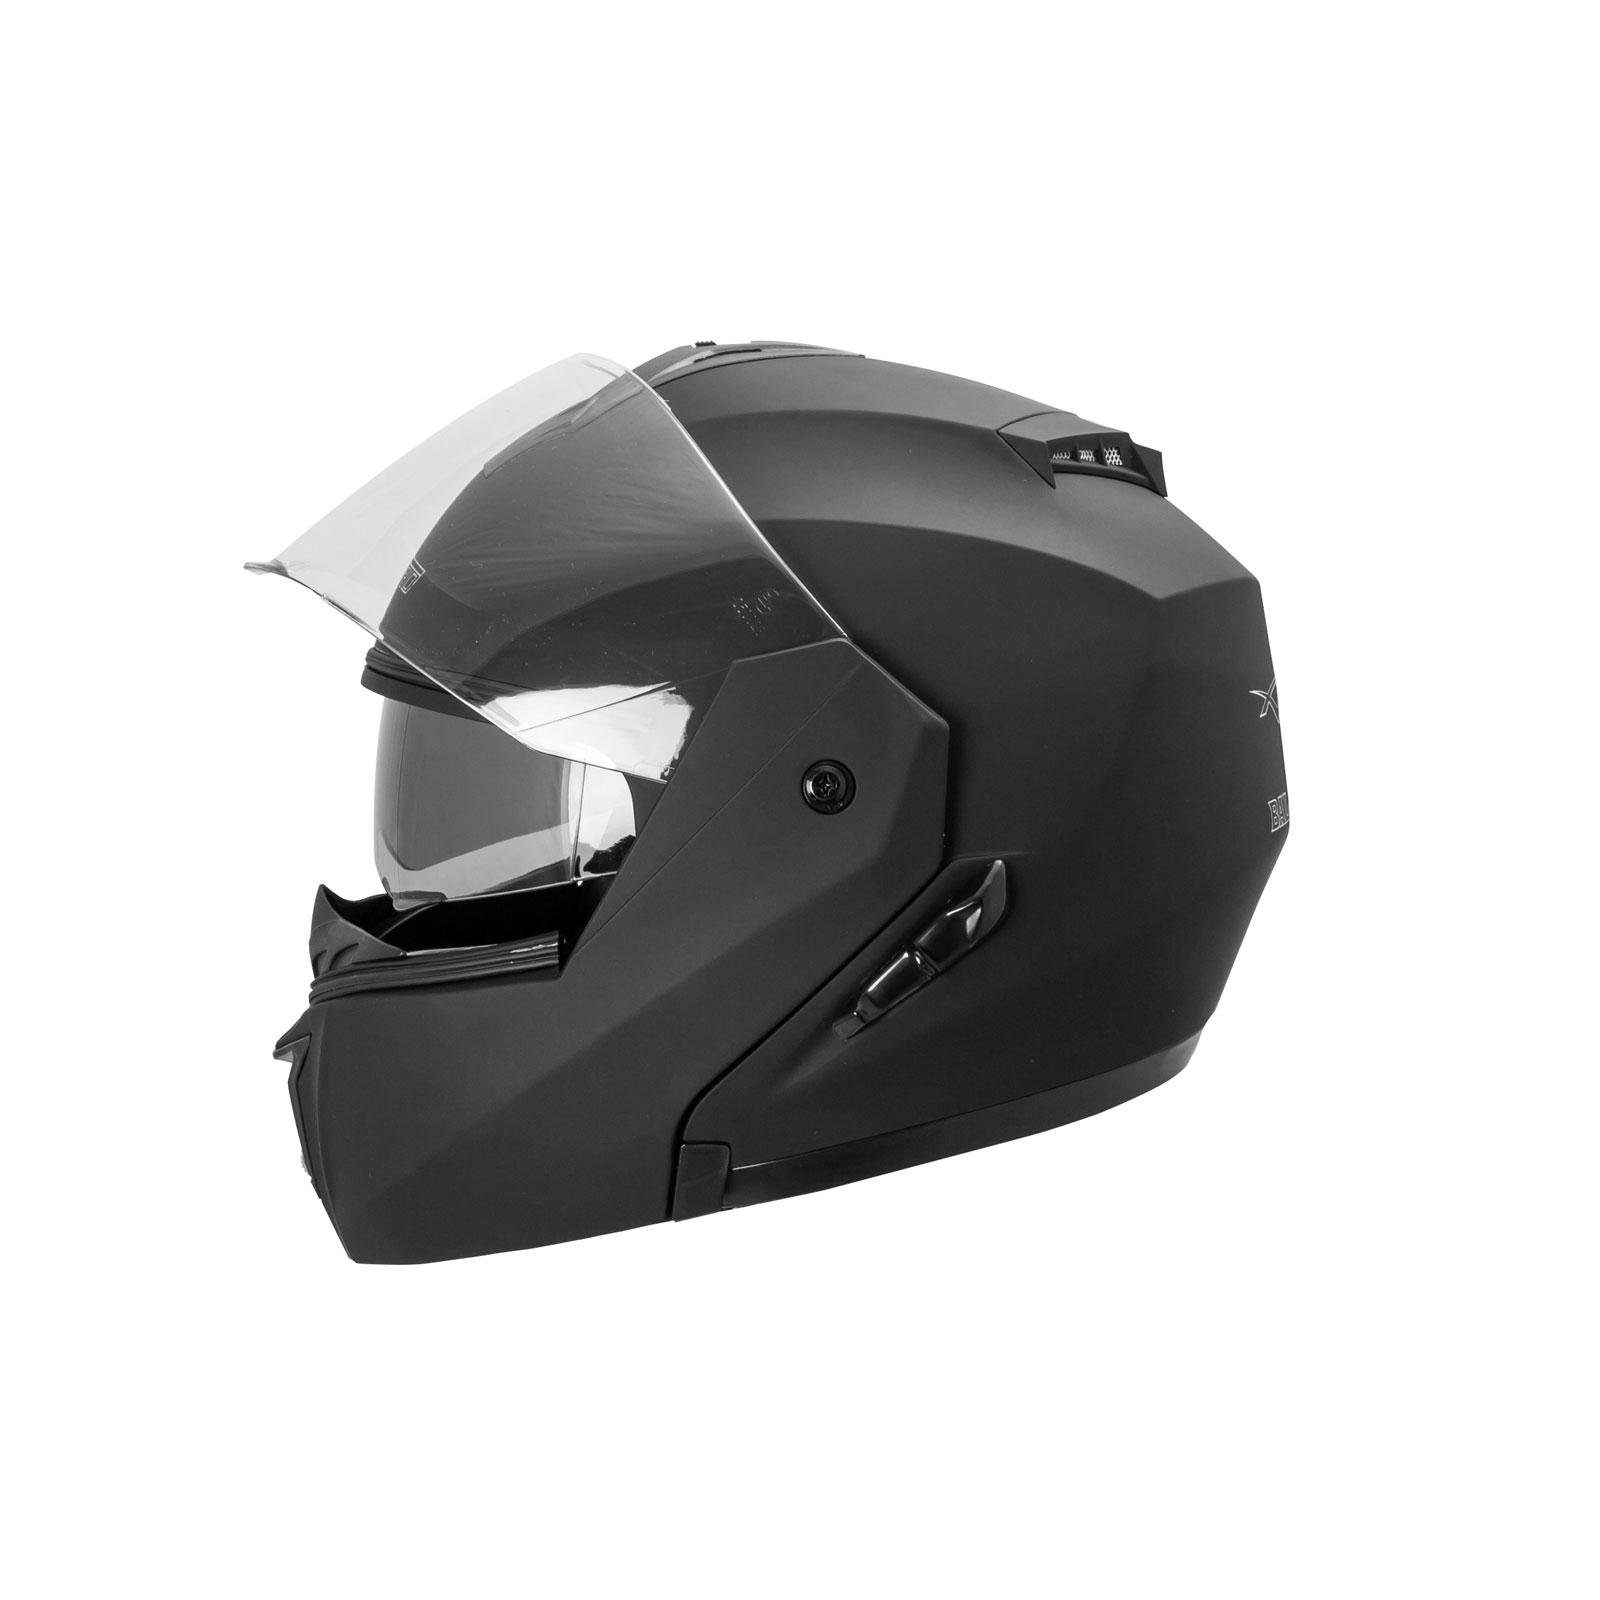 casque int gral double visi re ece 22 05 moto scooter noir. Black Bedroom Furniture Sets. Home Design Ideas